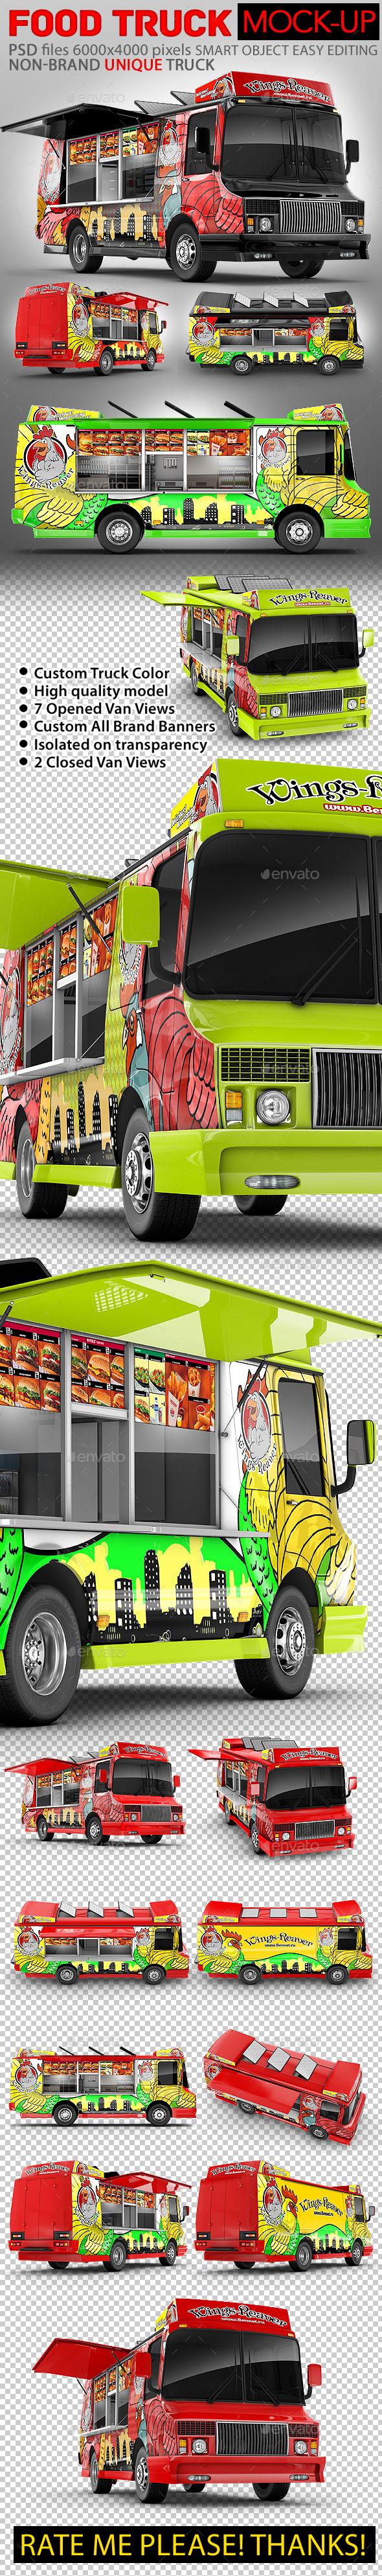 Food Truck Mock-Up. Unique 3D model mockup. - Vehicle Wraps Print